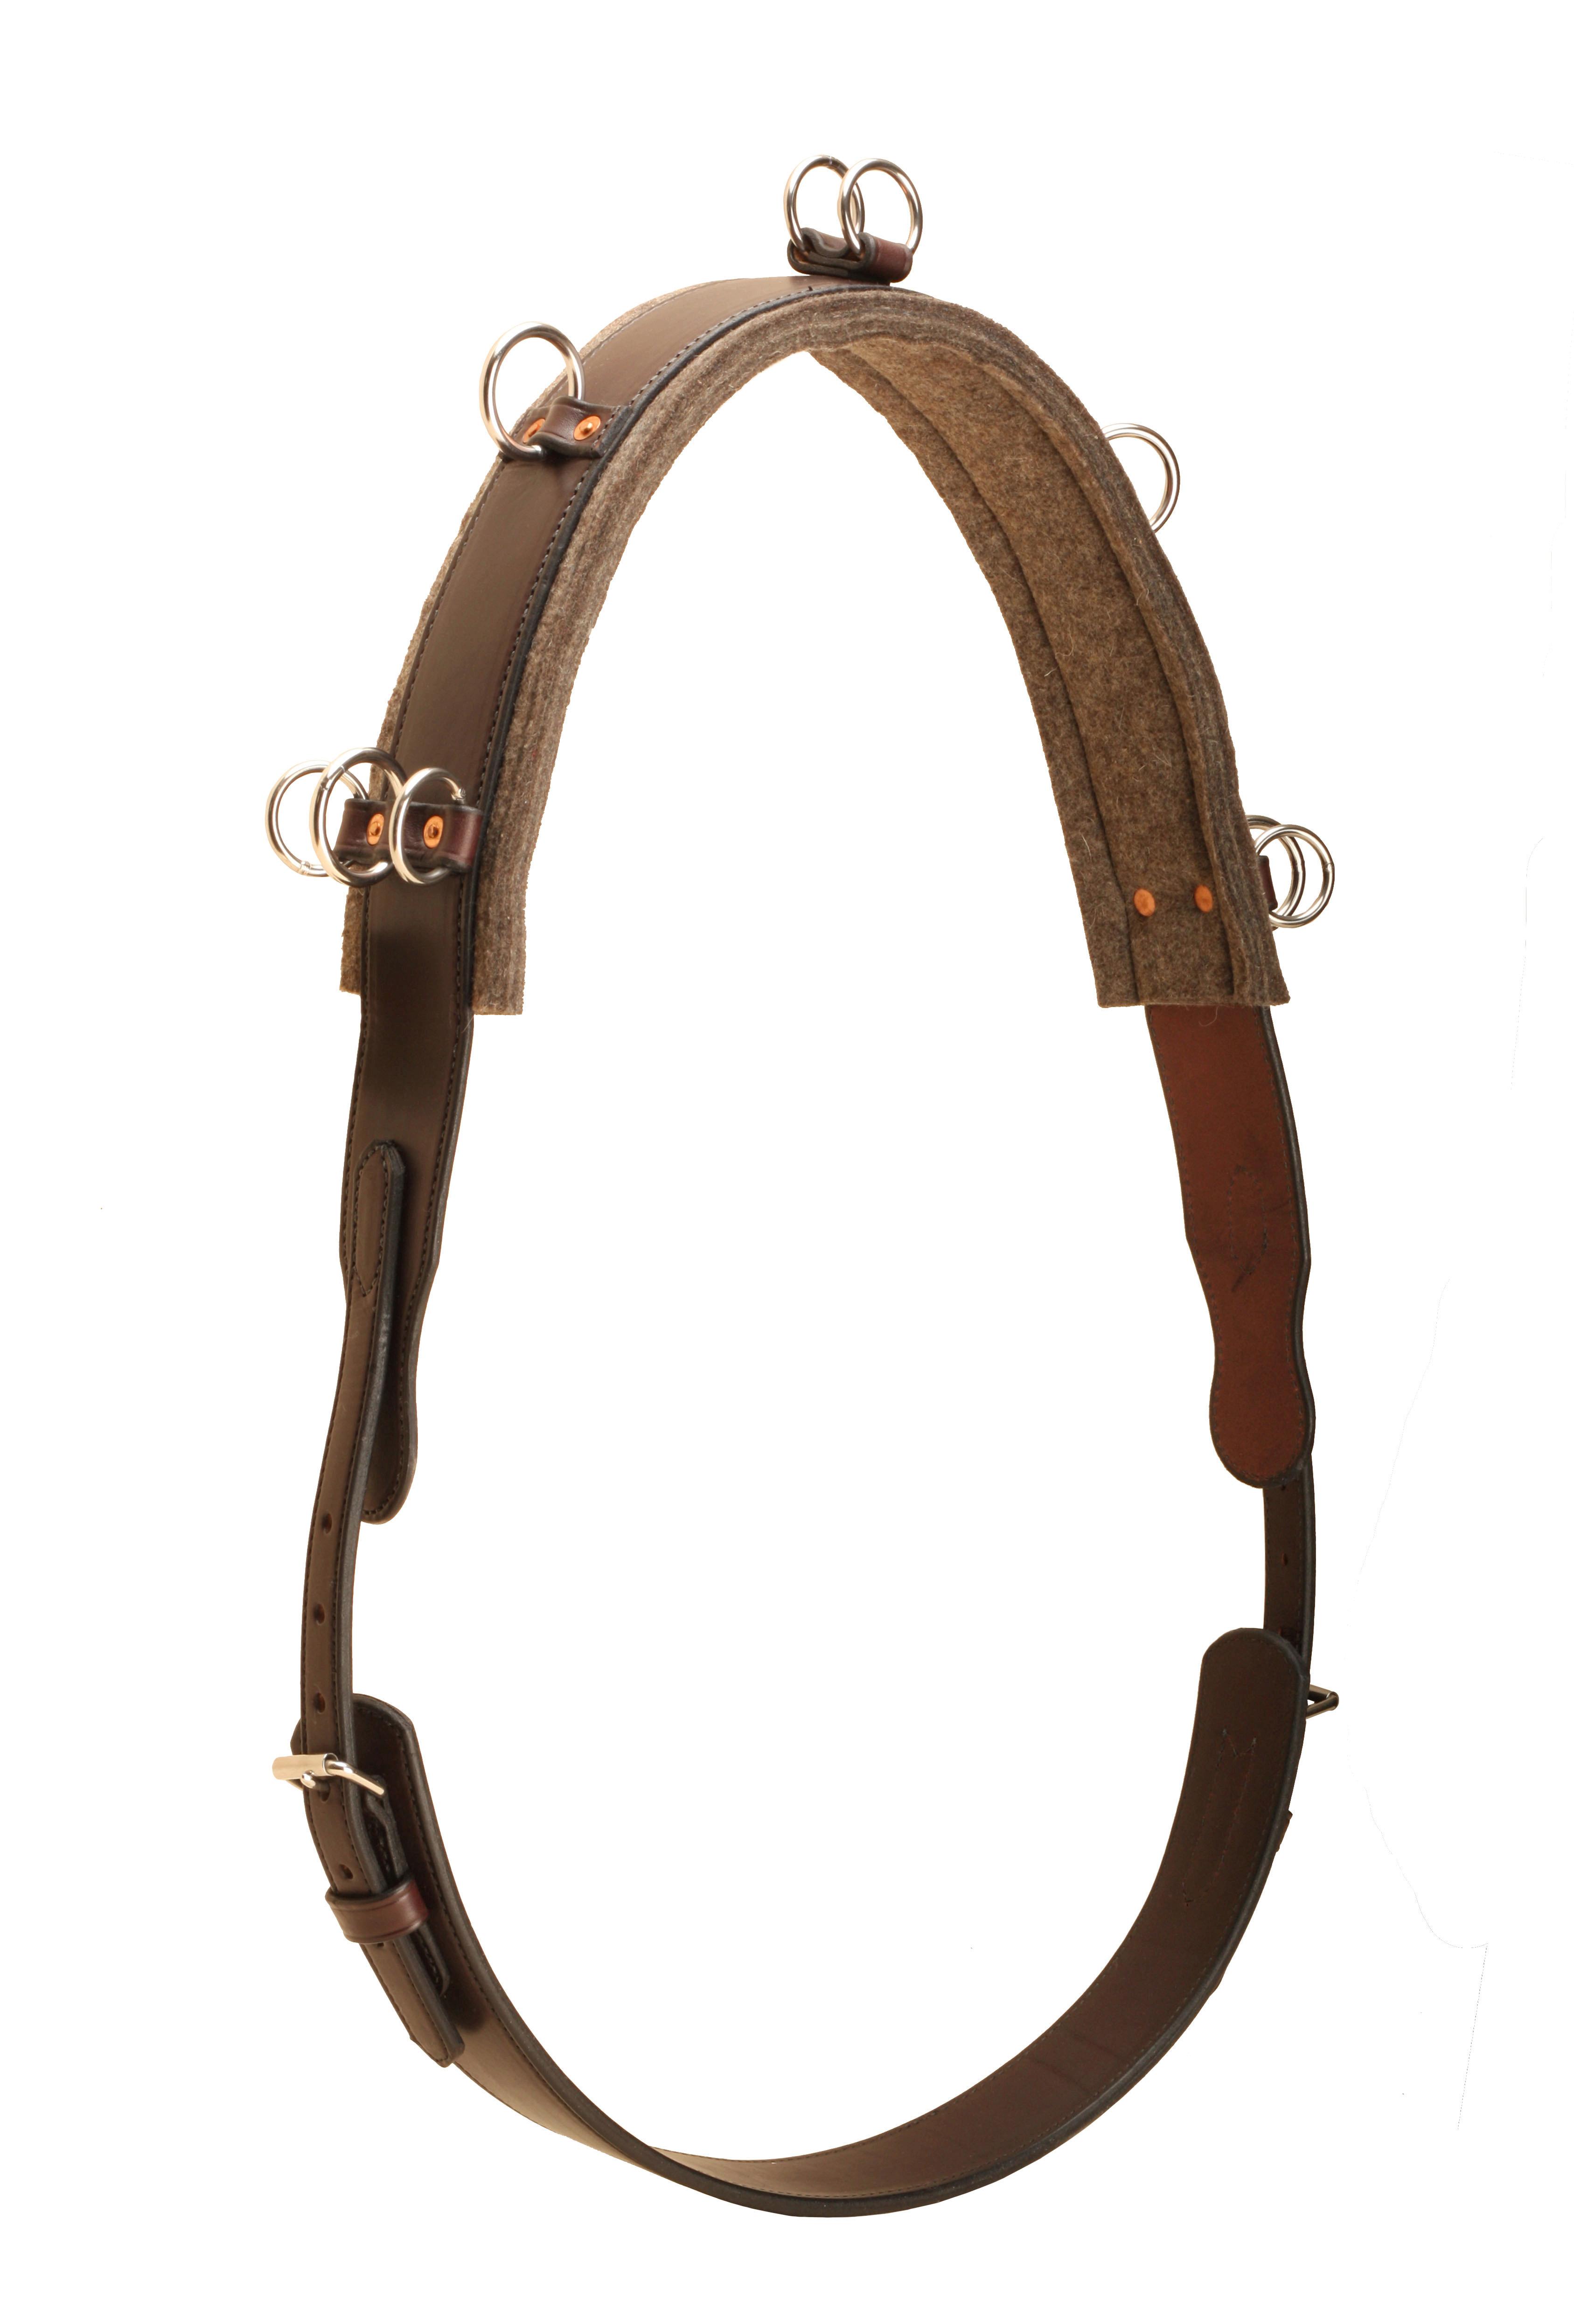 Tory Leather English Bridle Leather Surcingle